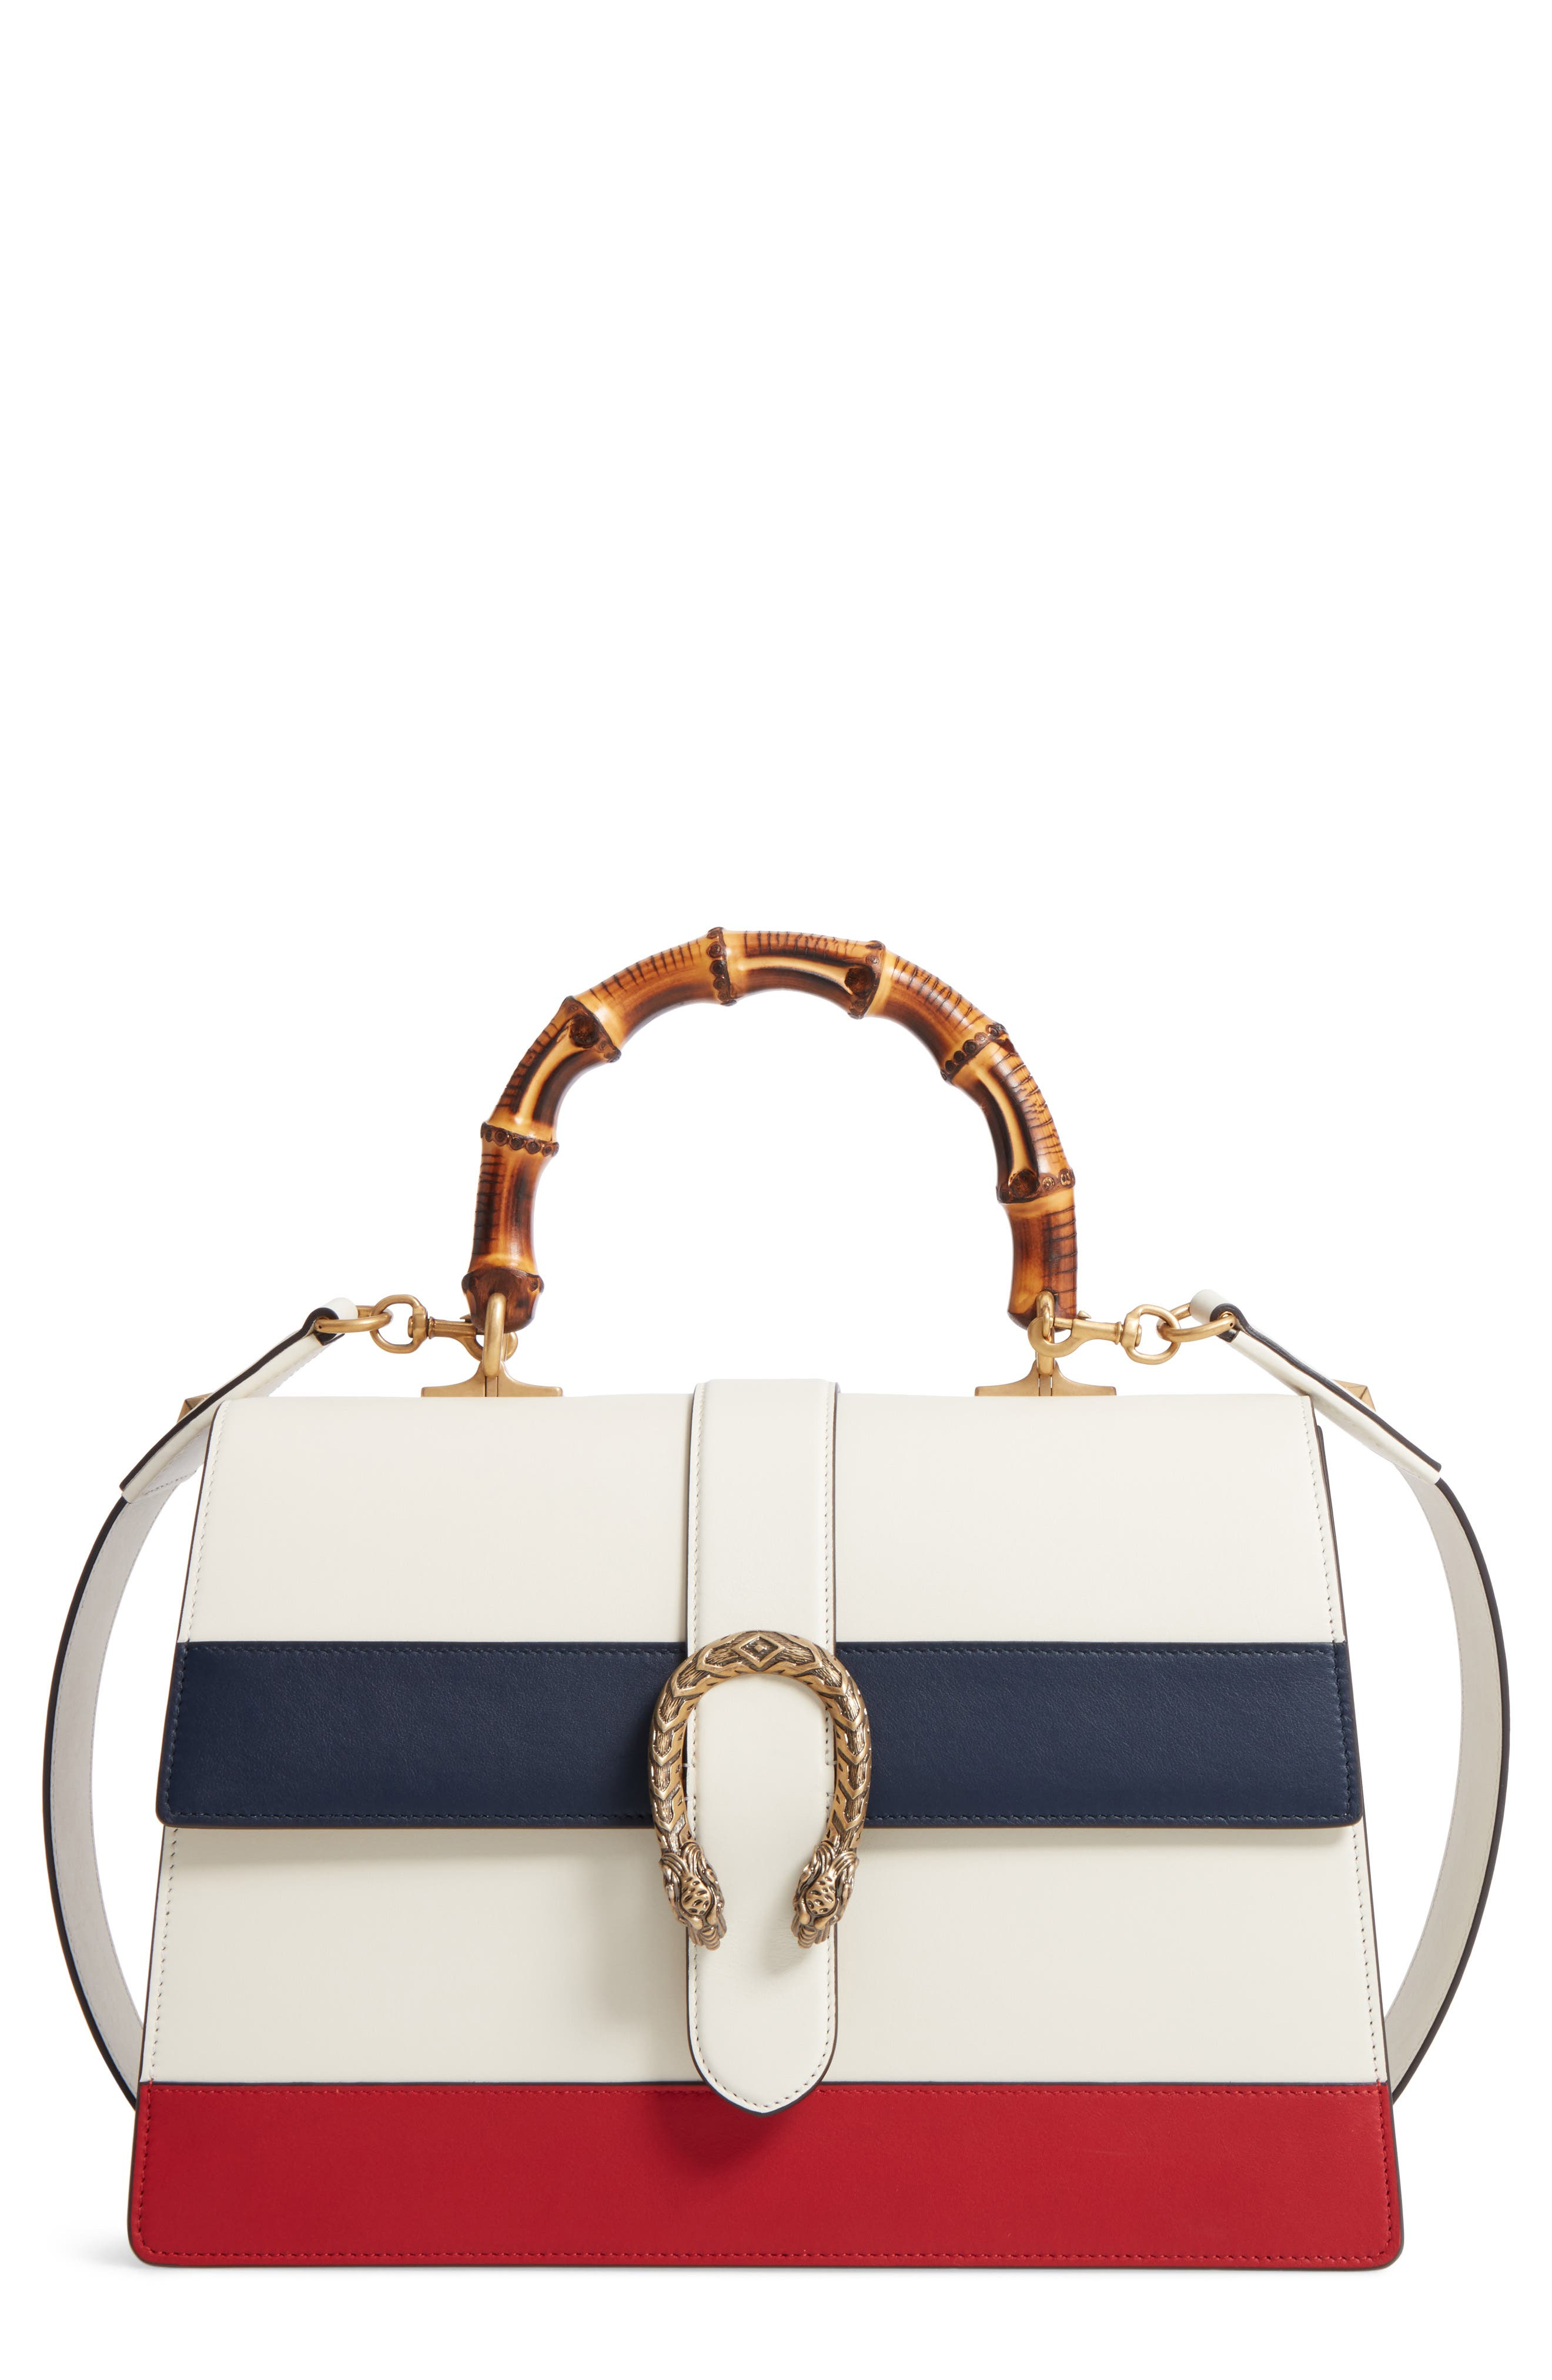 Gucci Large Dionysus Top Handle Leather Shoulder Bag